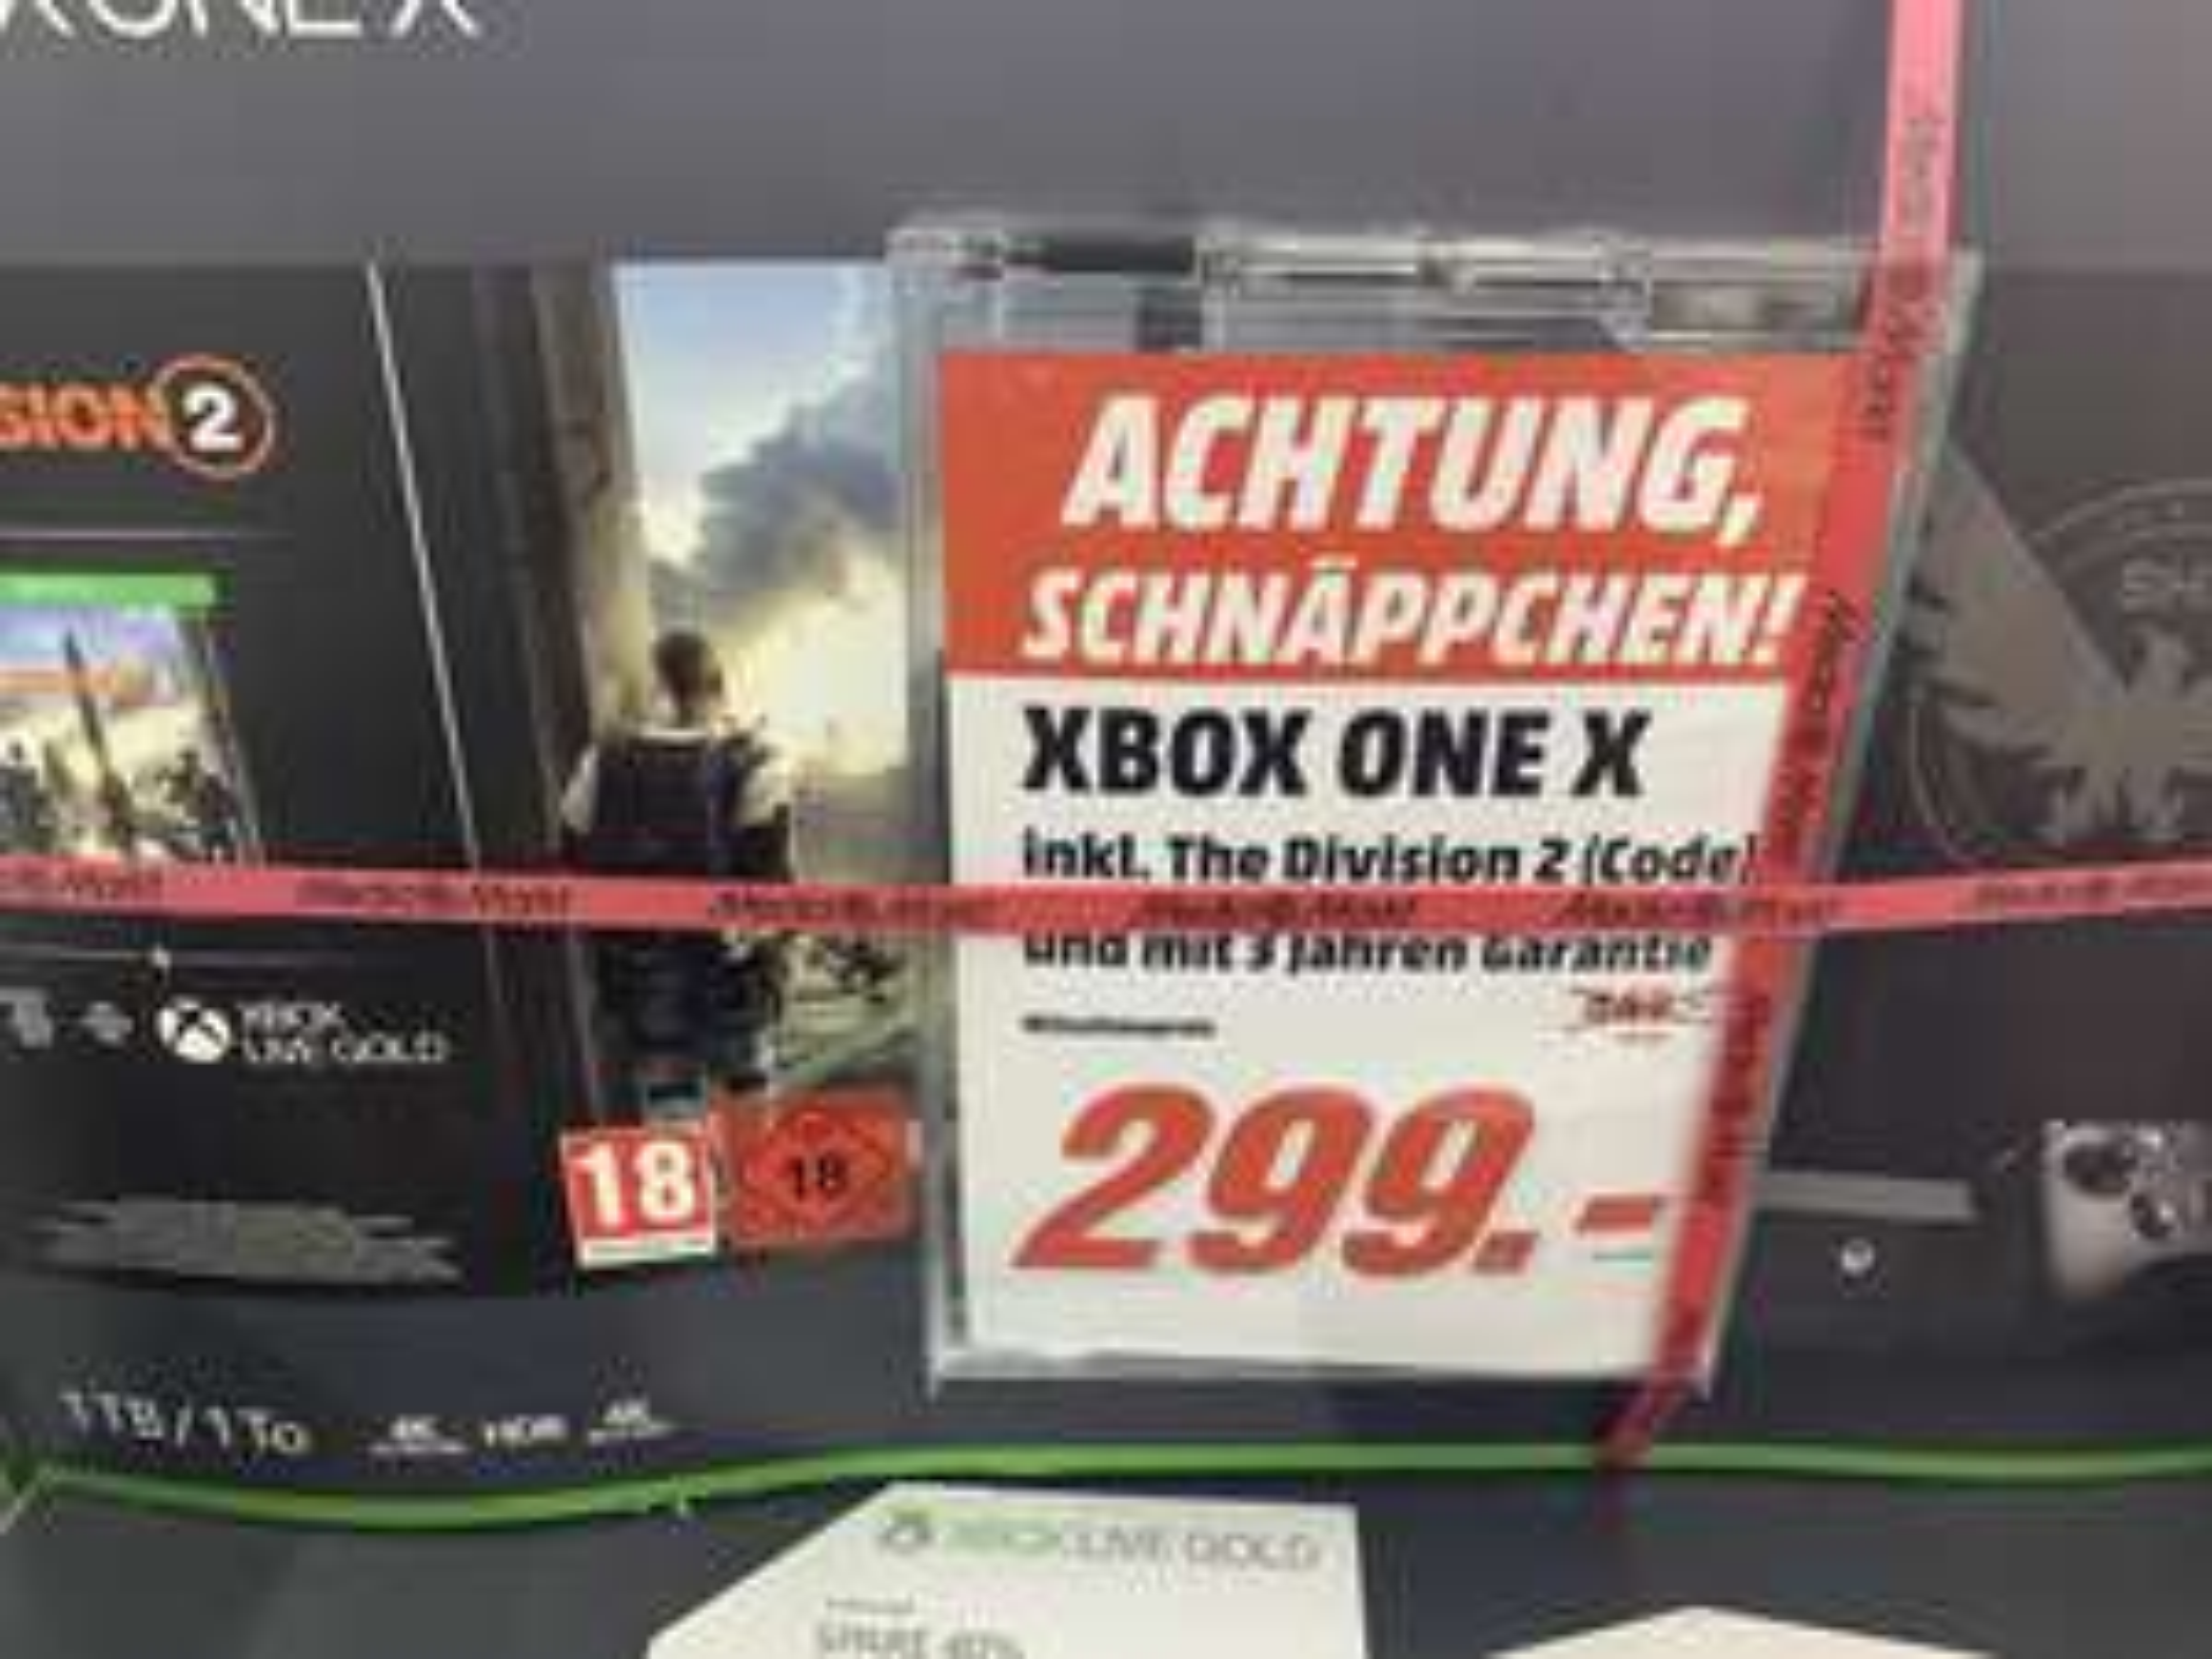 Microsoft Xbox One X 1TB + Tom Clancy's: The Division 2 Bundle + 3 Jahre Garantie + 1 Monat Xbox Live°Media Markt Berlin Alexa°Lokal